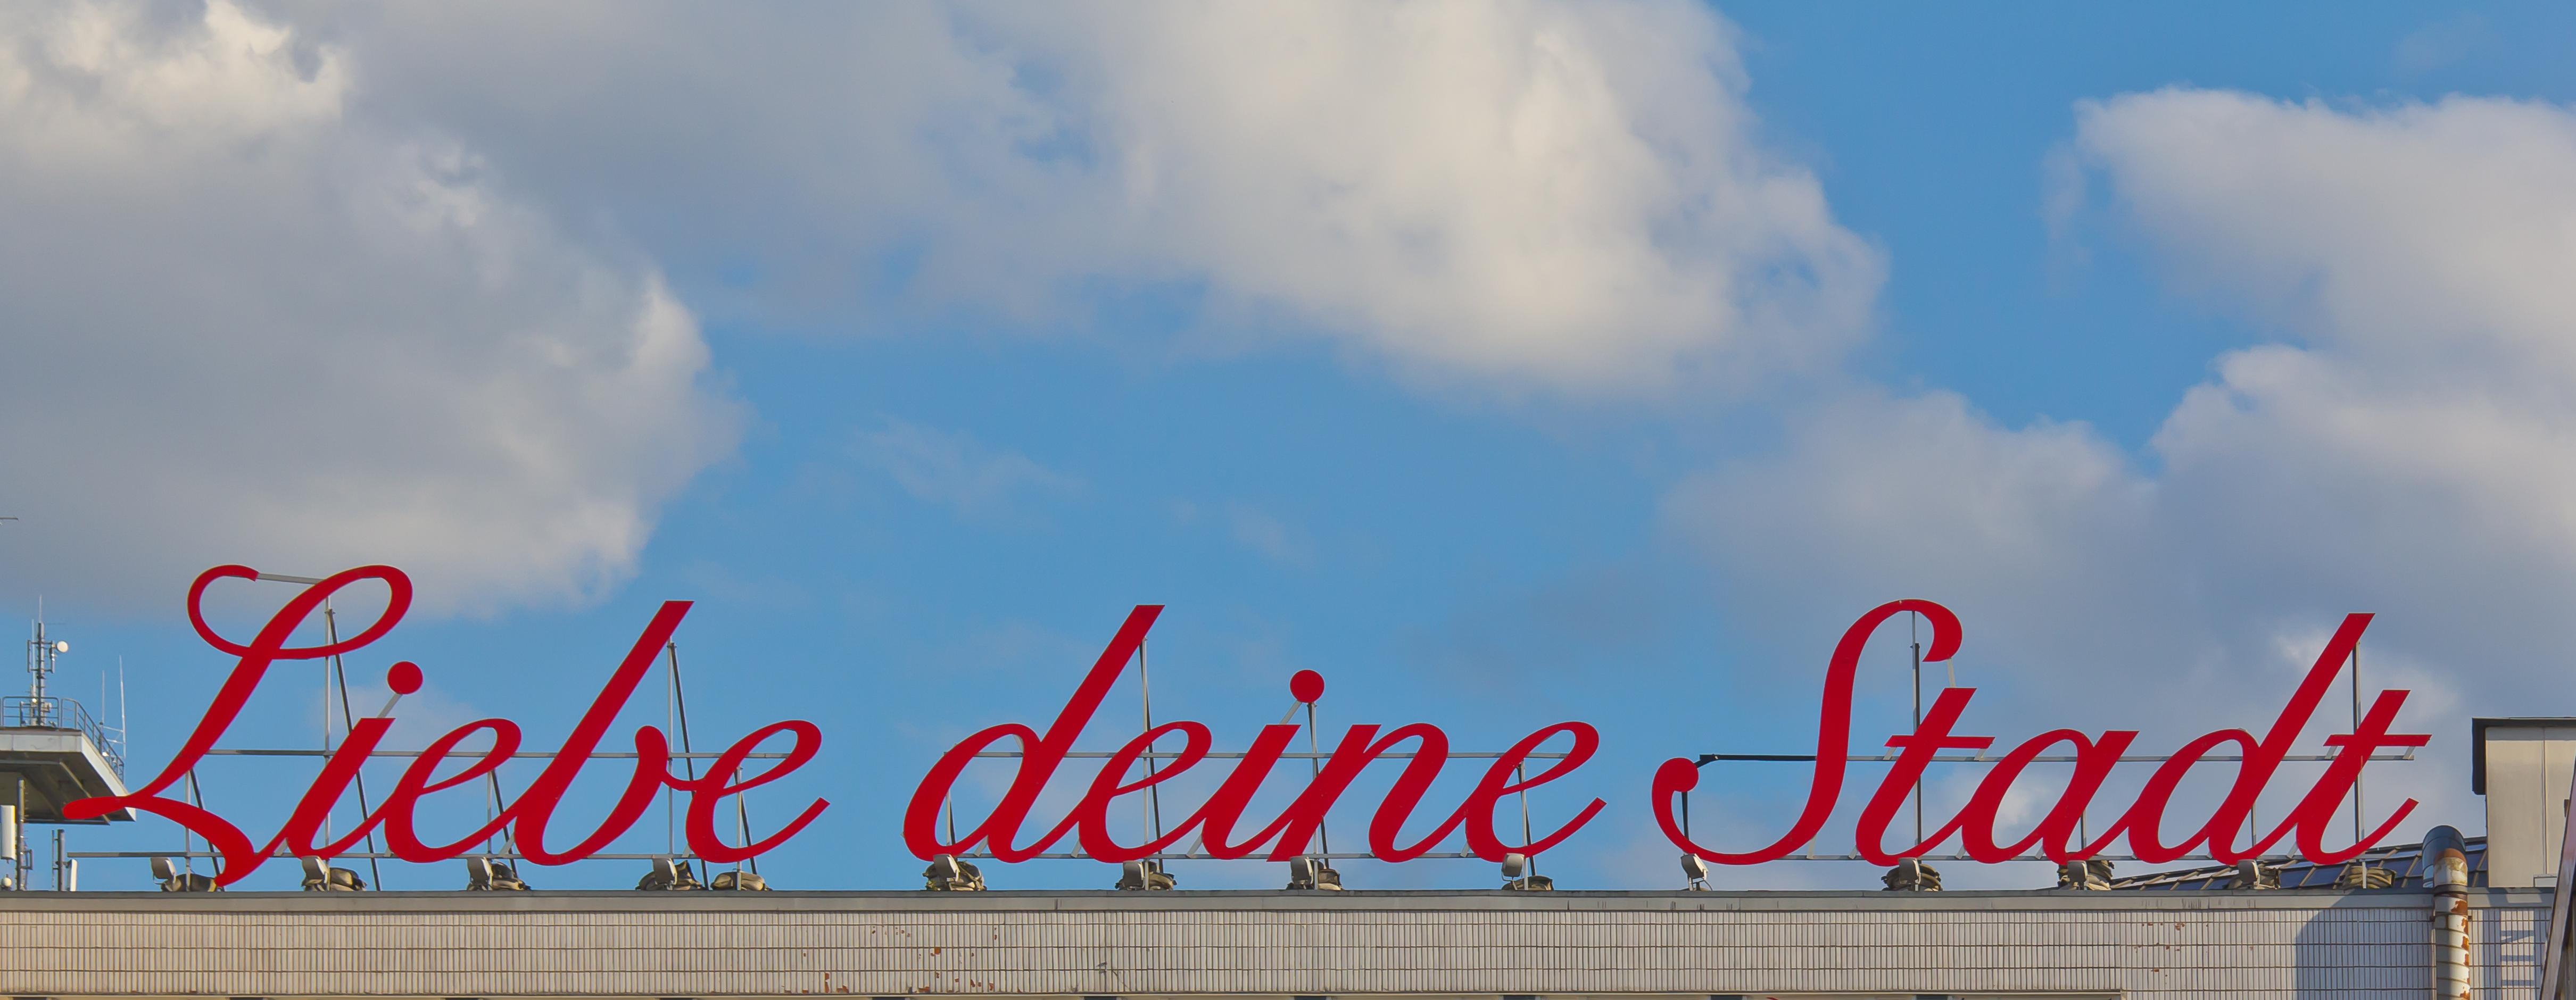 https://upload.wikimedia.org/wikipedia/commons/a/af/Liebe_deine_Stadt-K%C3%B6ln-3839.jpg